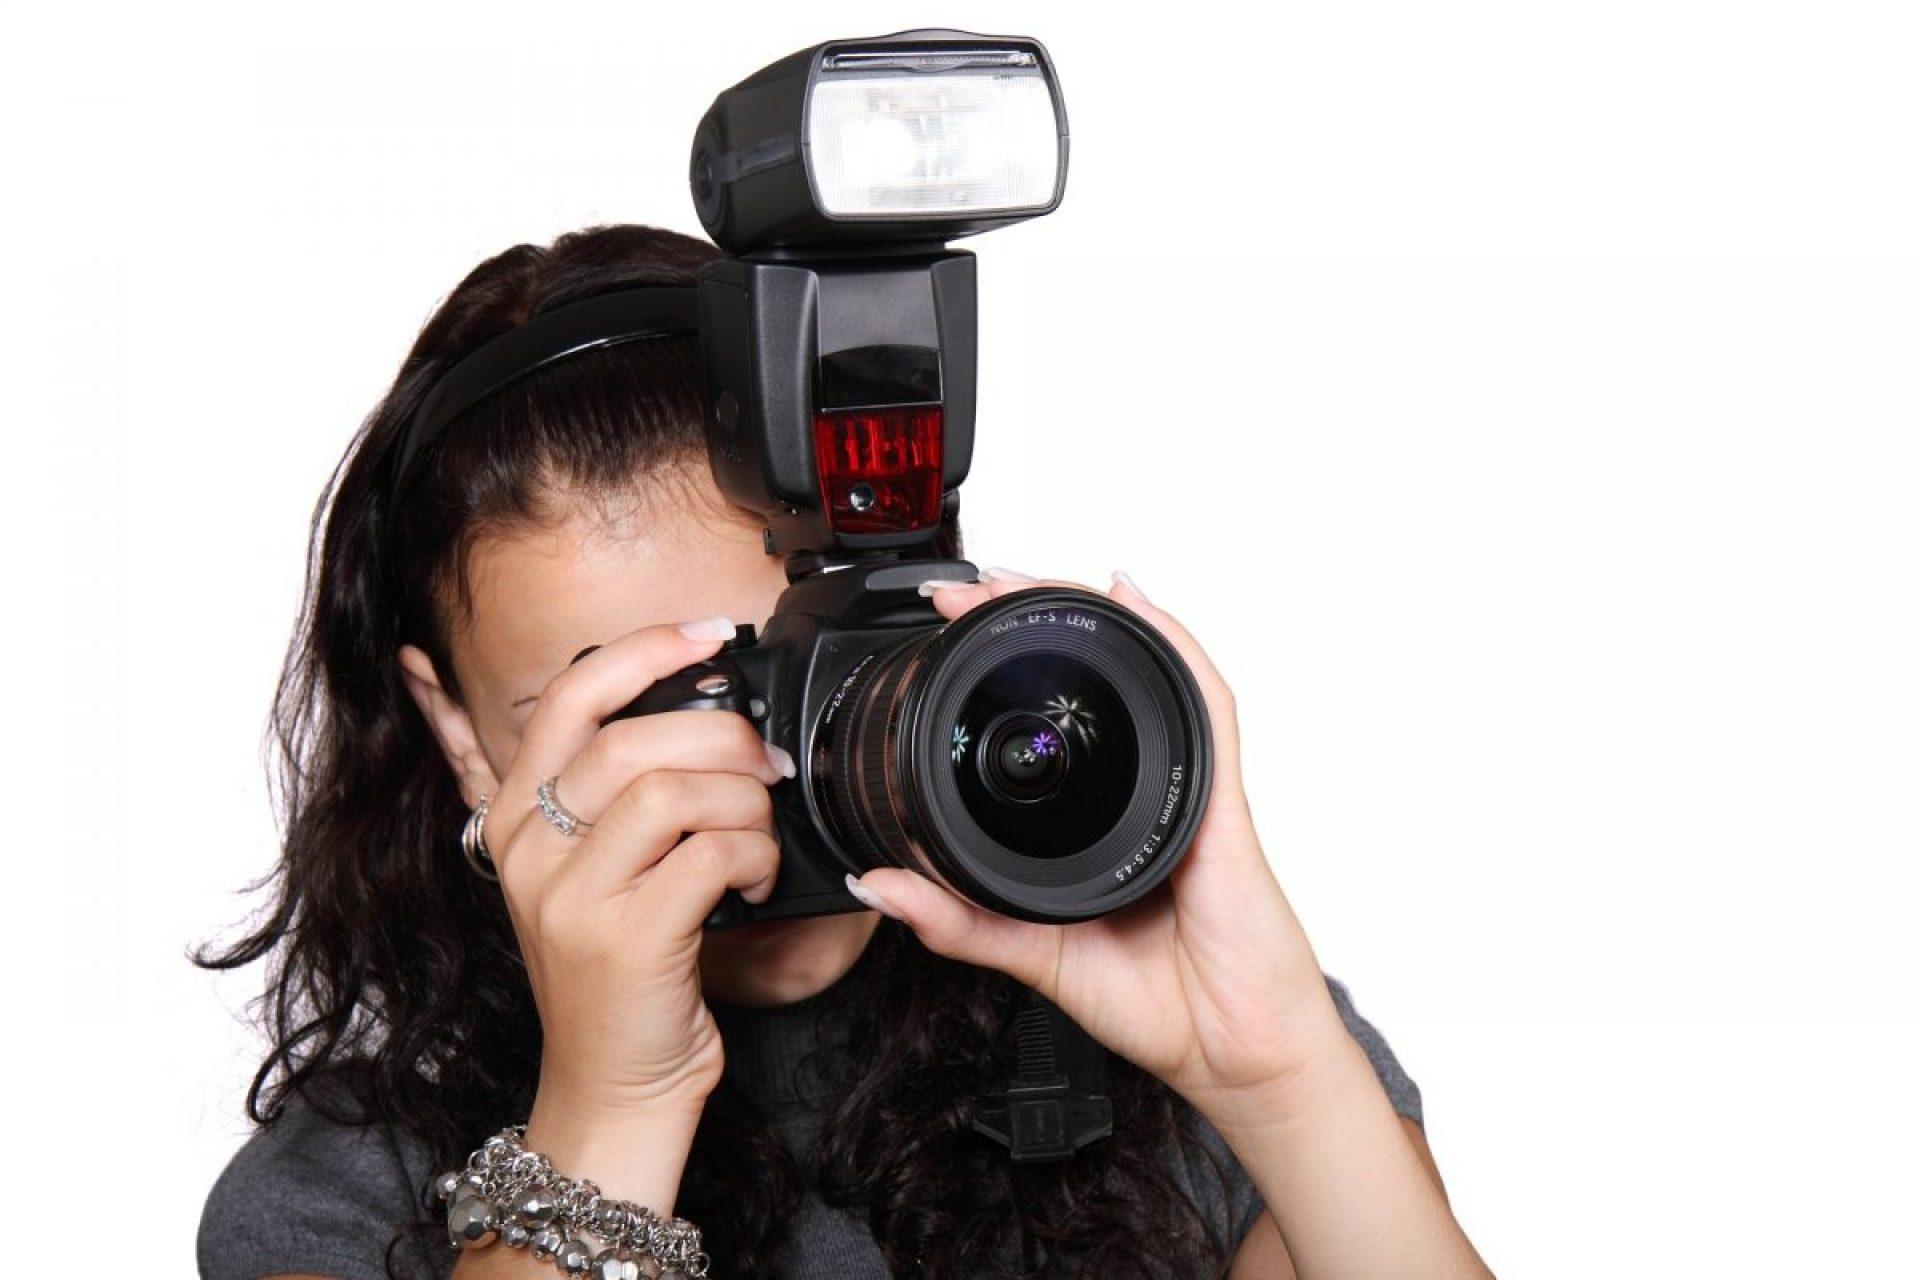 camera-16048_1920